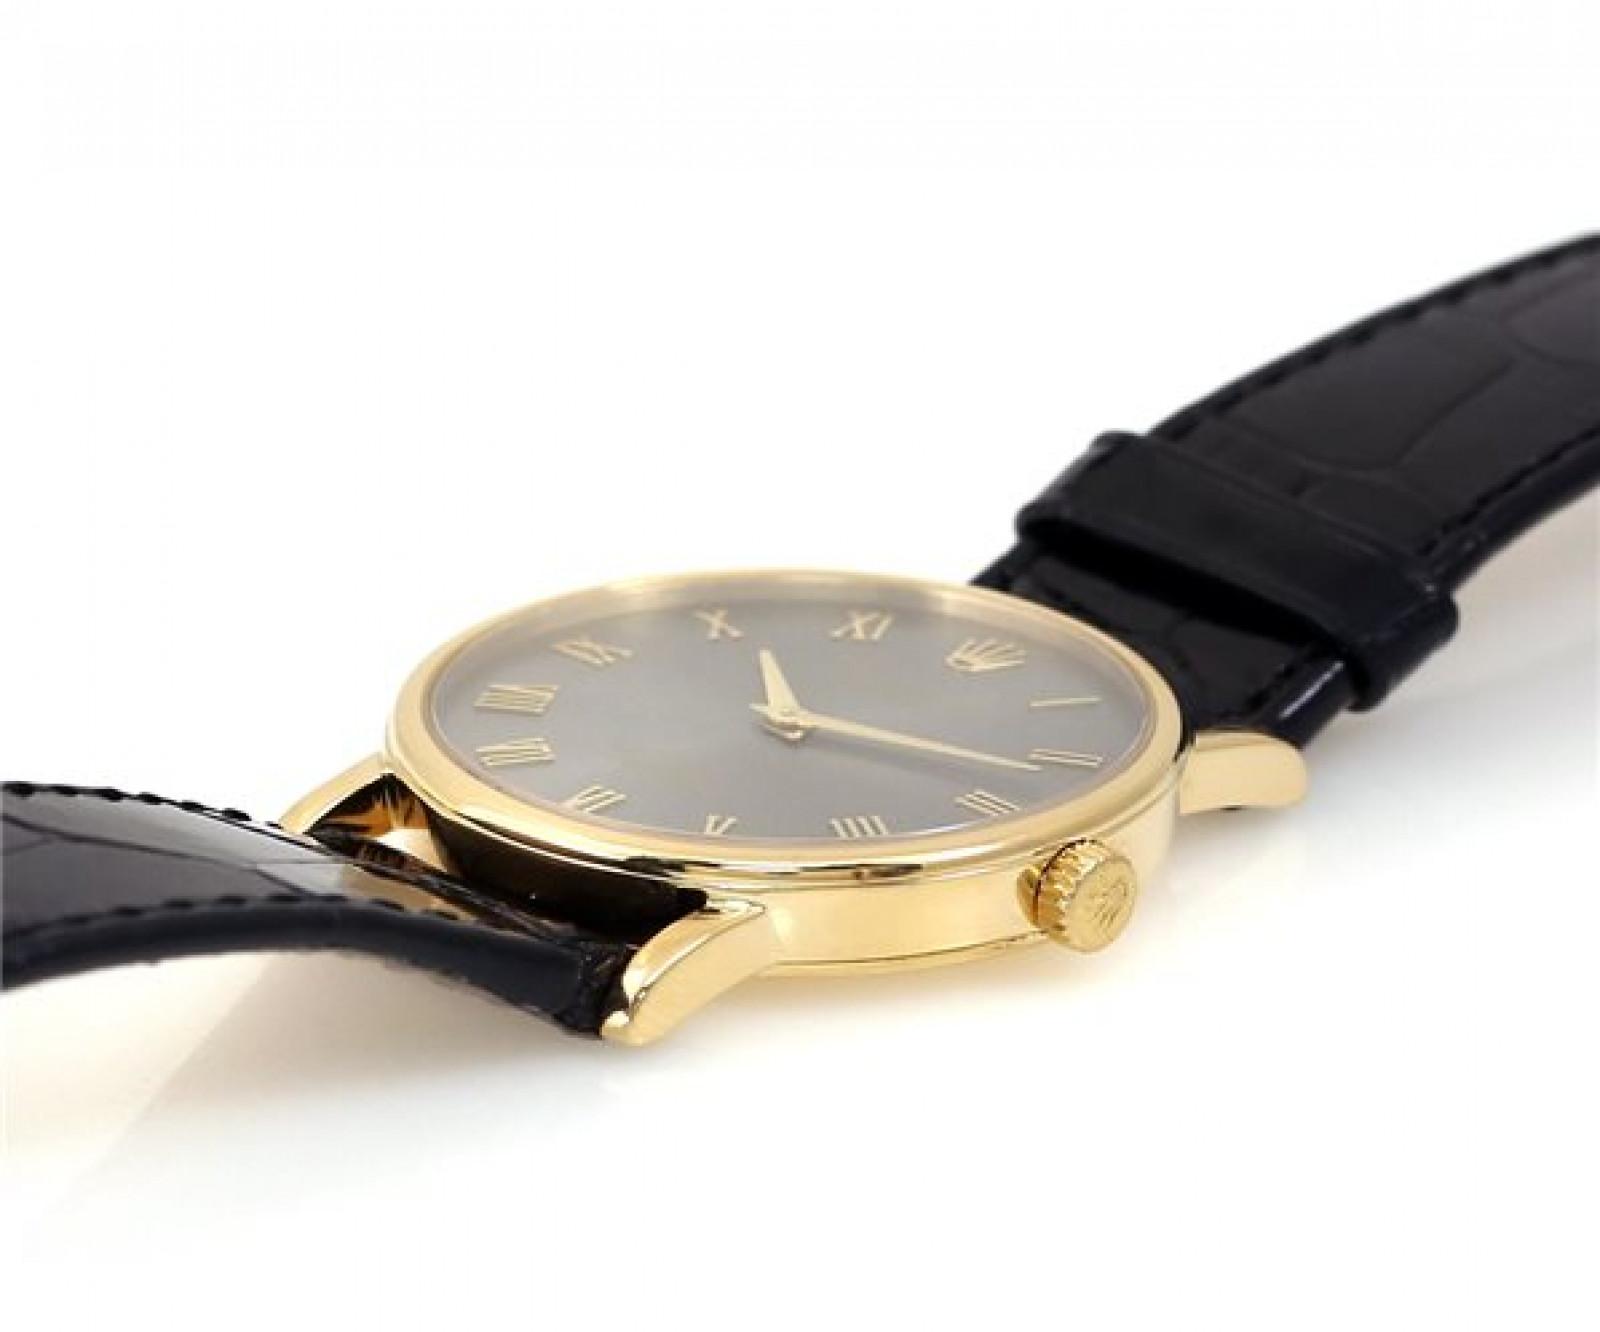 Rolex Cellini 5115 Gold Year 2004